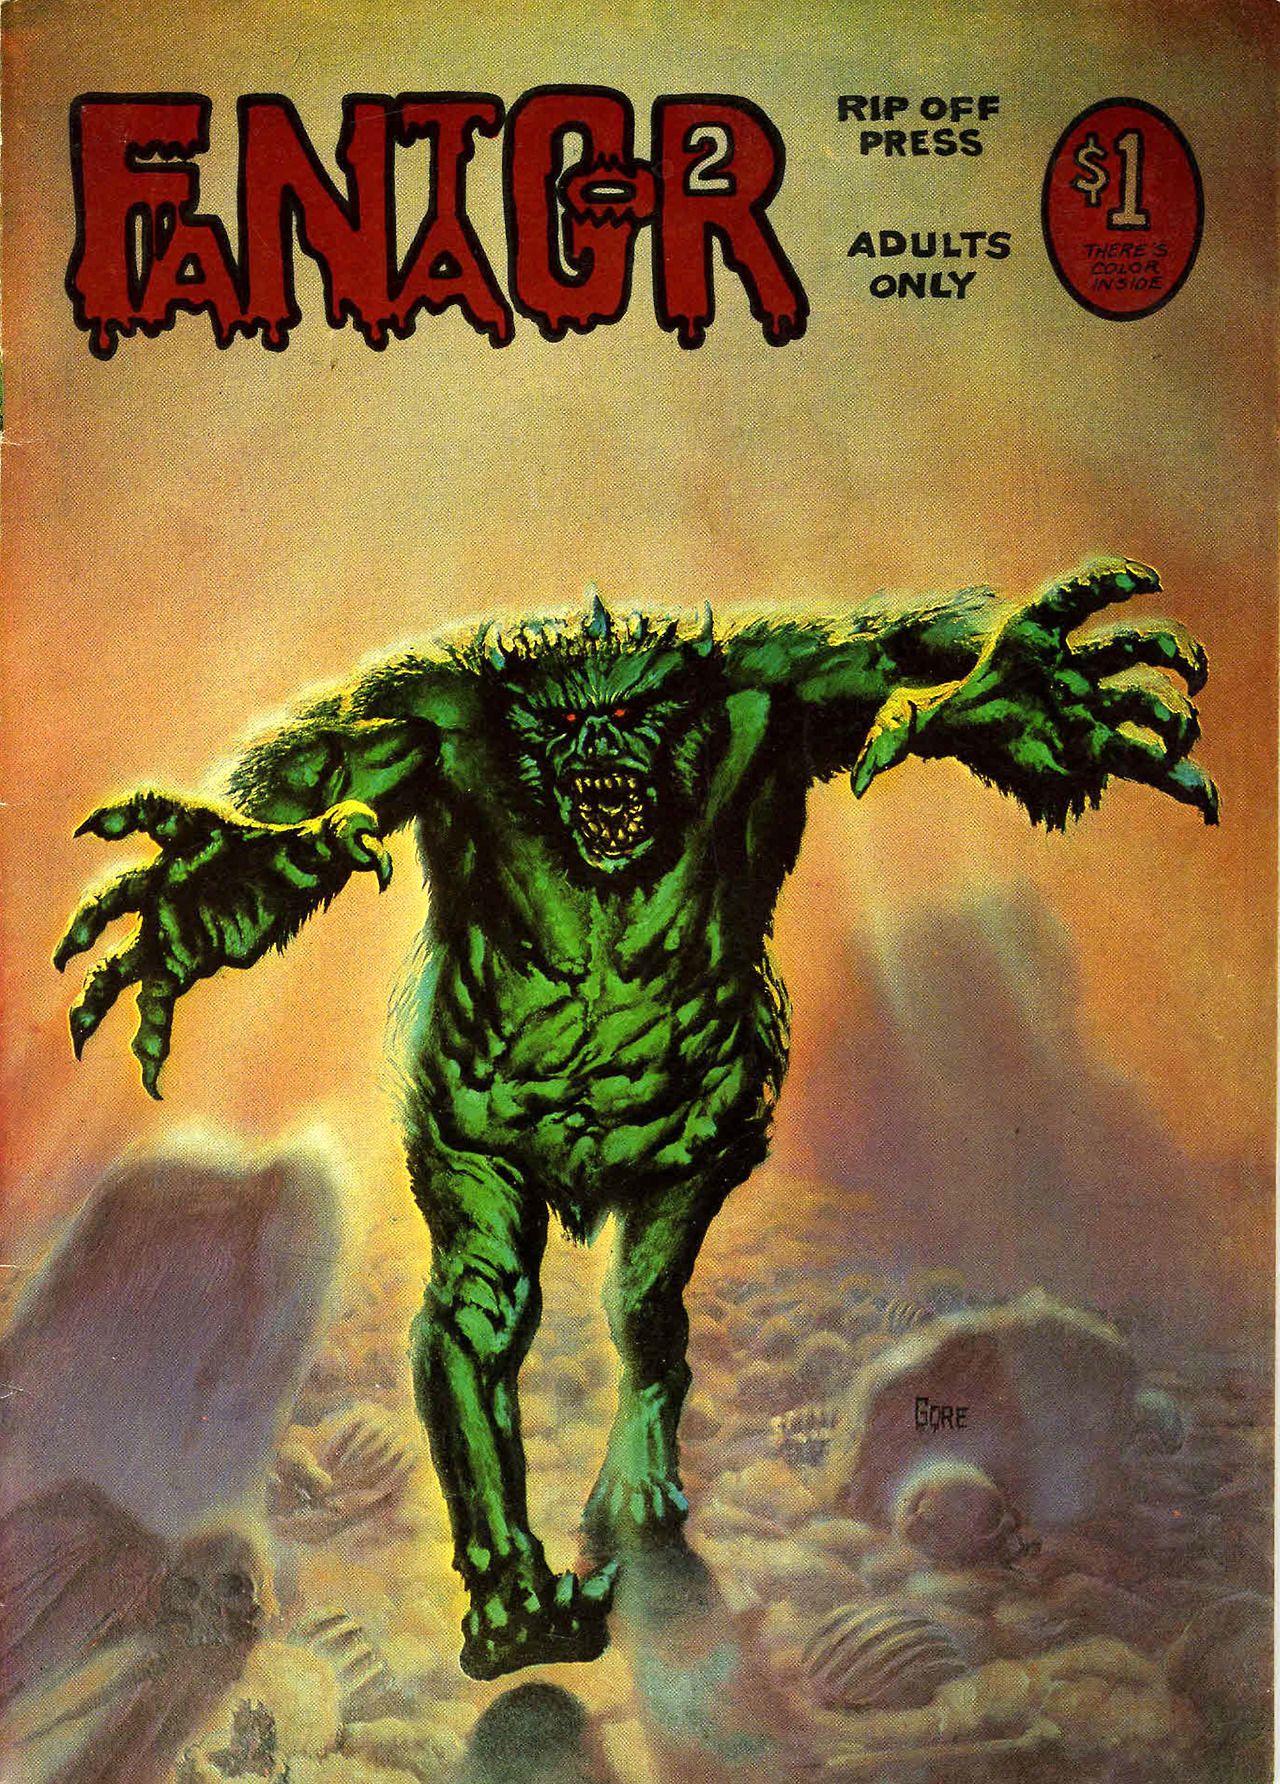 Richard Corben - Fantagor #2 (Rip Off Press, 1972)